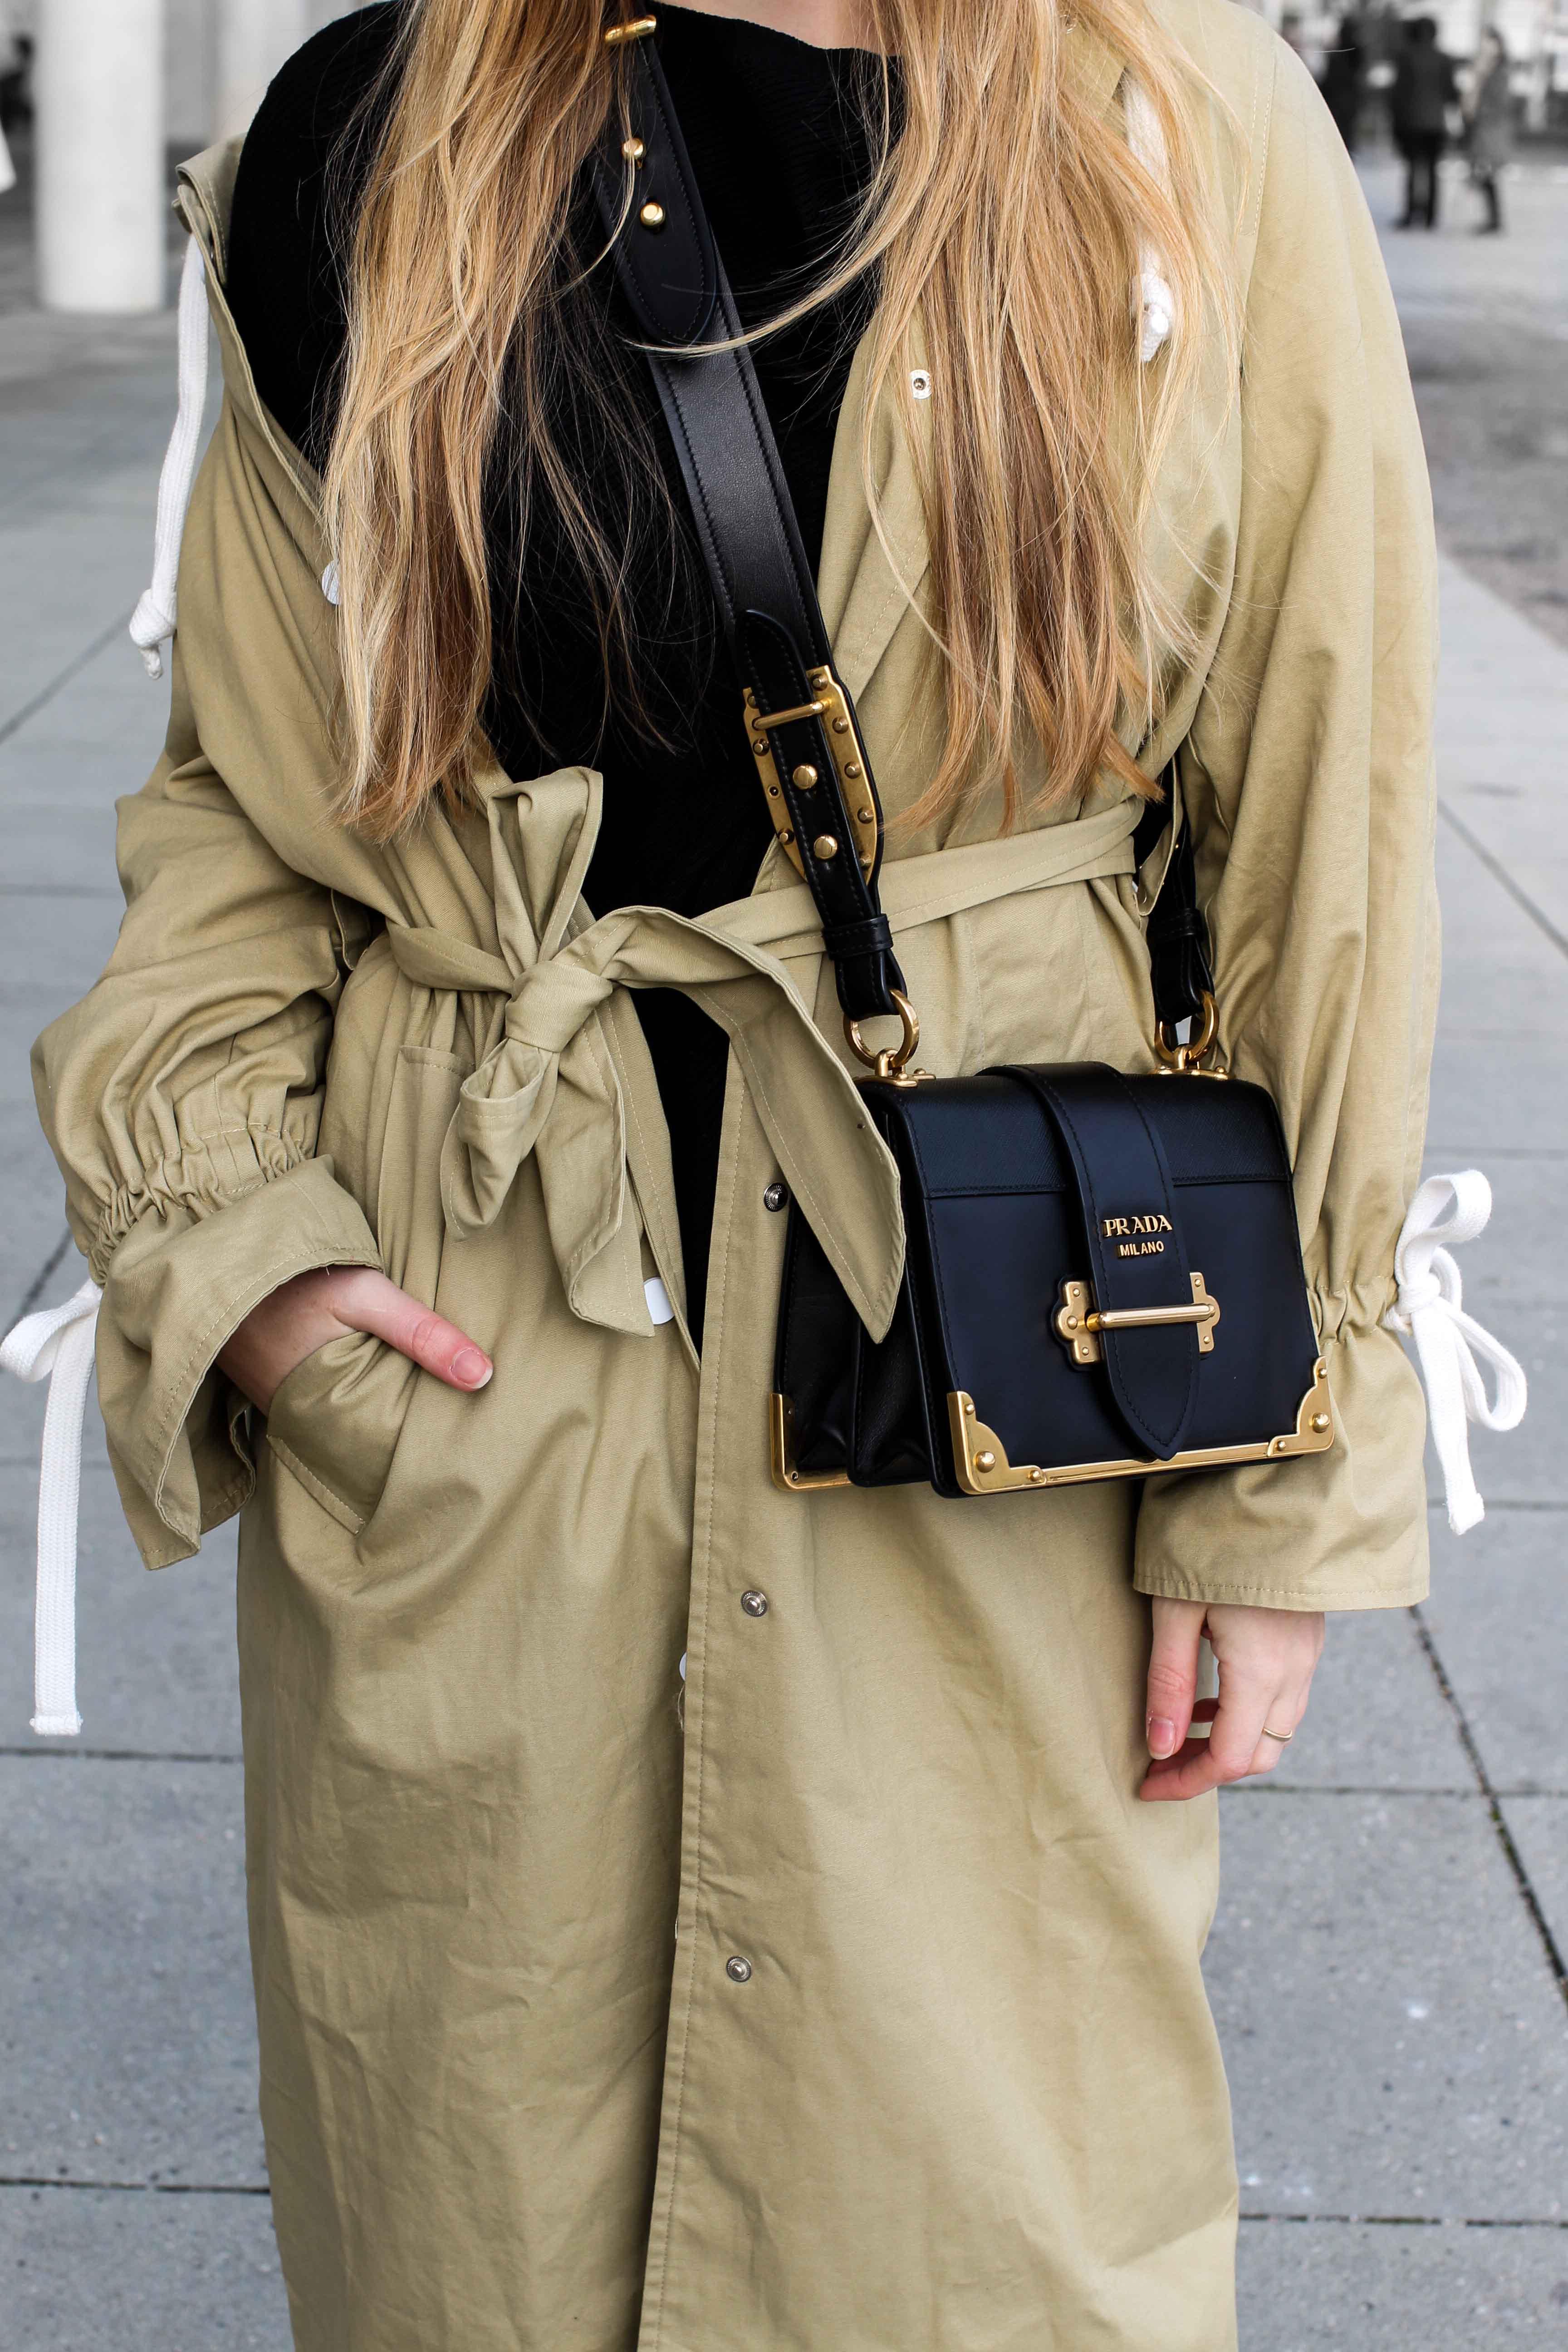 Trenchcoat Edited Marisa Prada Cahier bag Modeblog Bonn Trenchcoat kombinieren Streetstyle